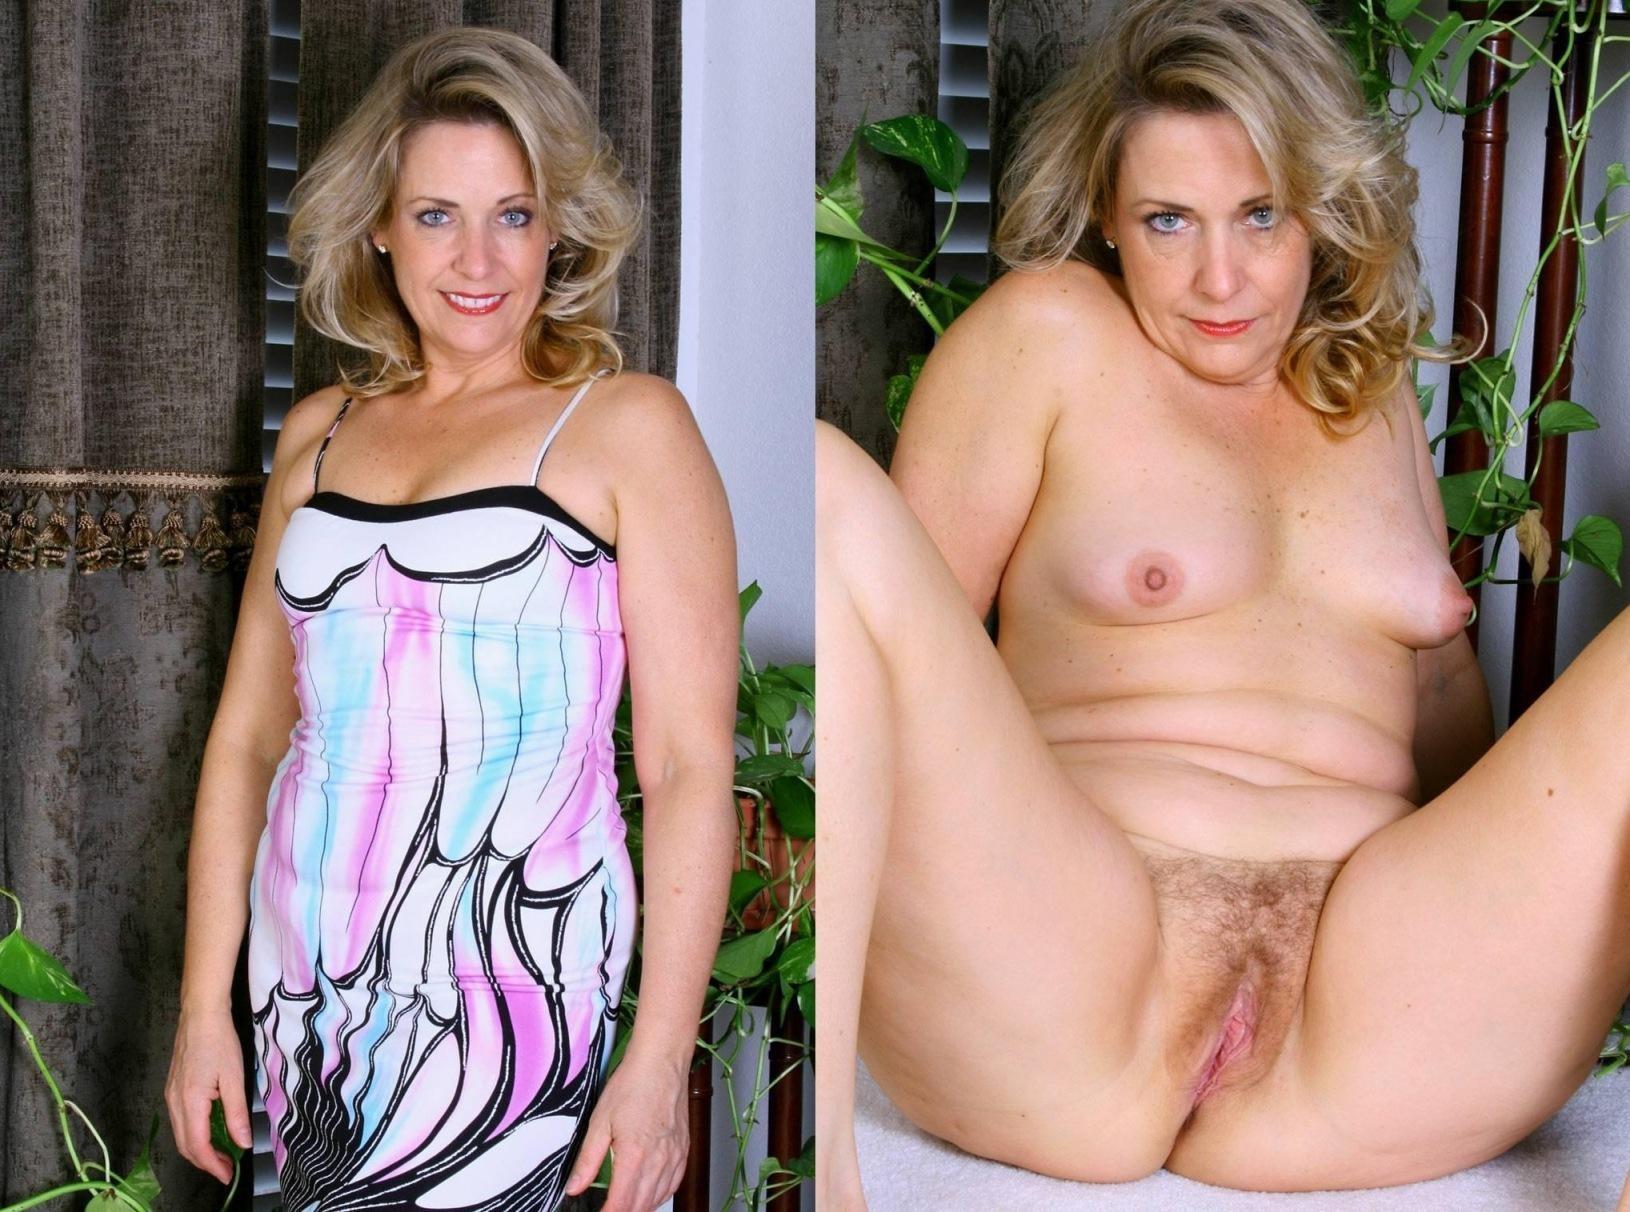 Mature Women Undressed